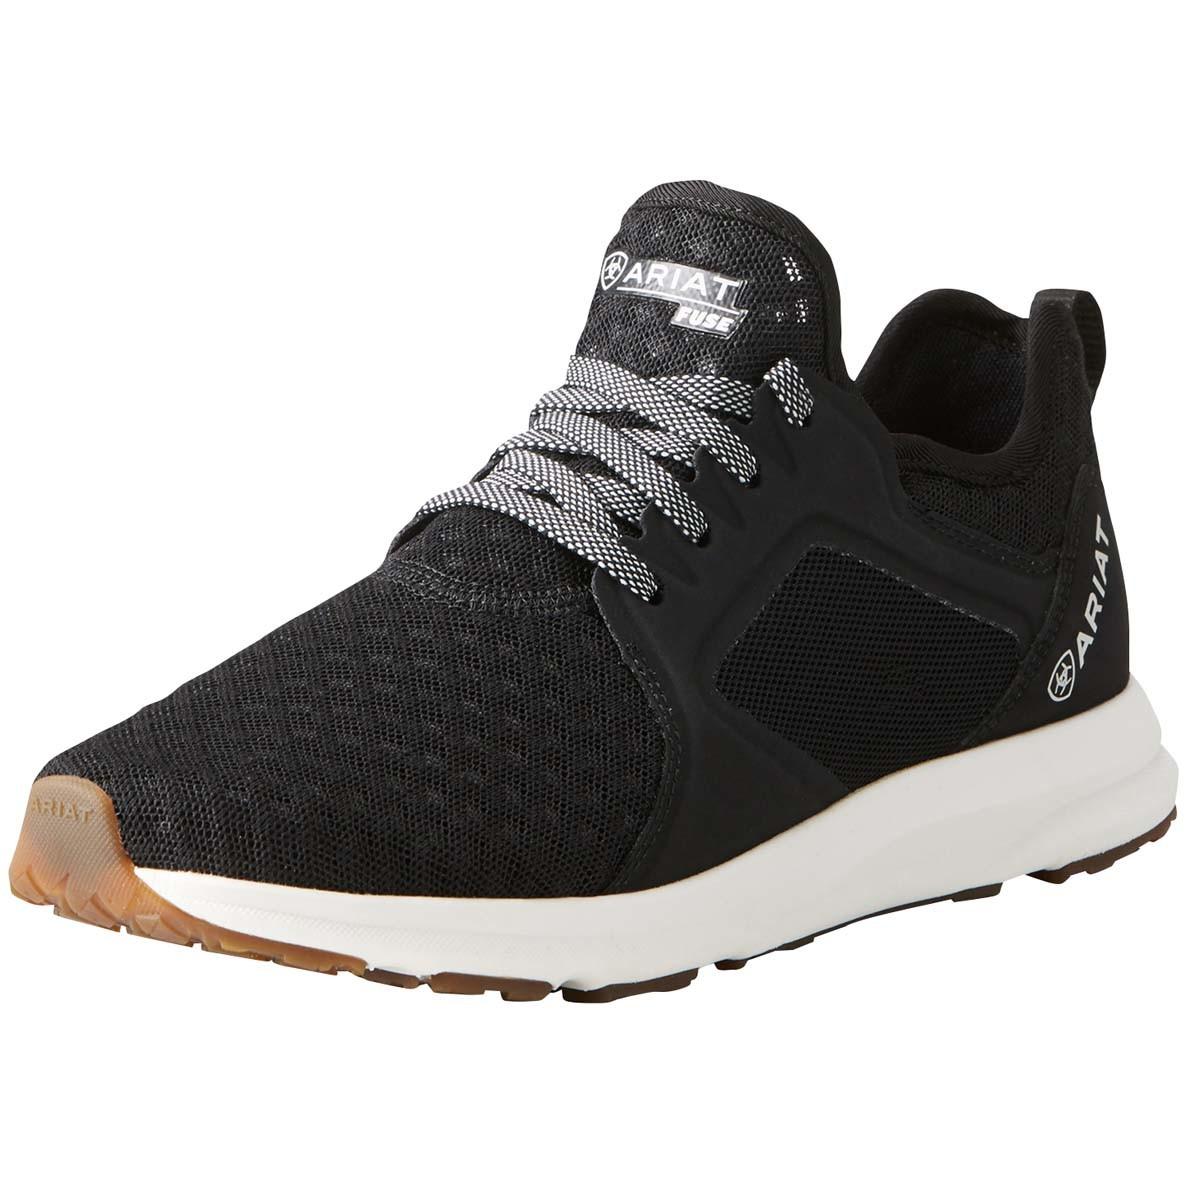 Ariat Fuse Sneakers